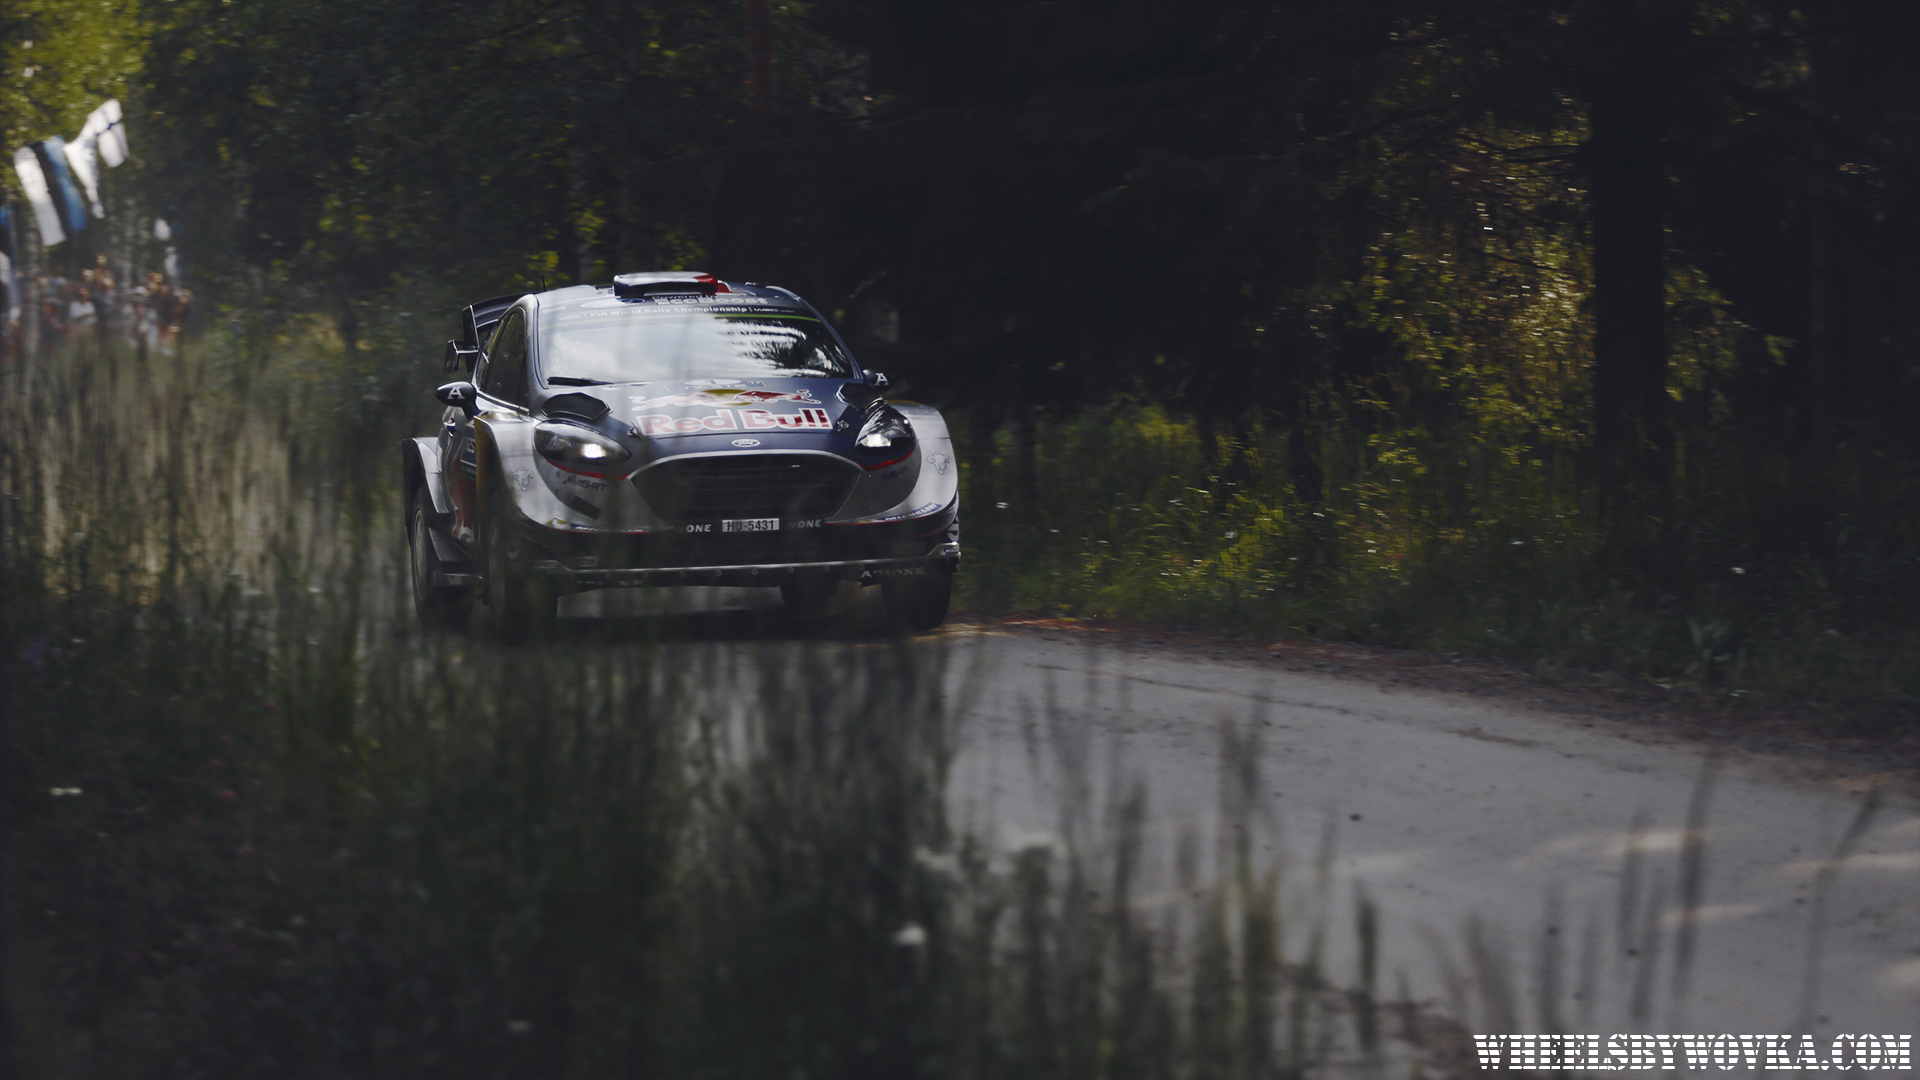 wrc-neste-rally-finalnd-2017-by-wheelsbywovka-4